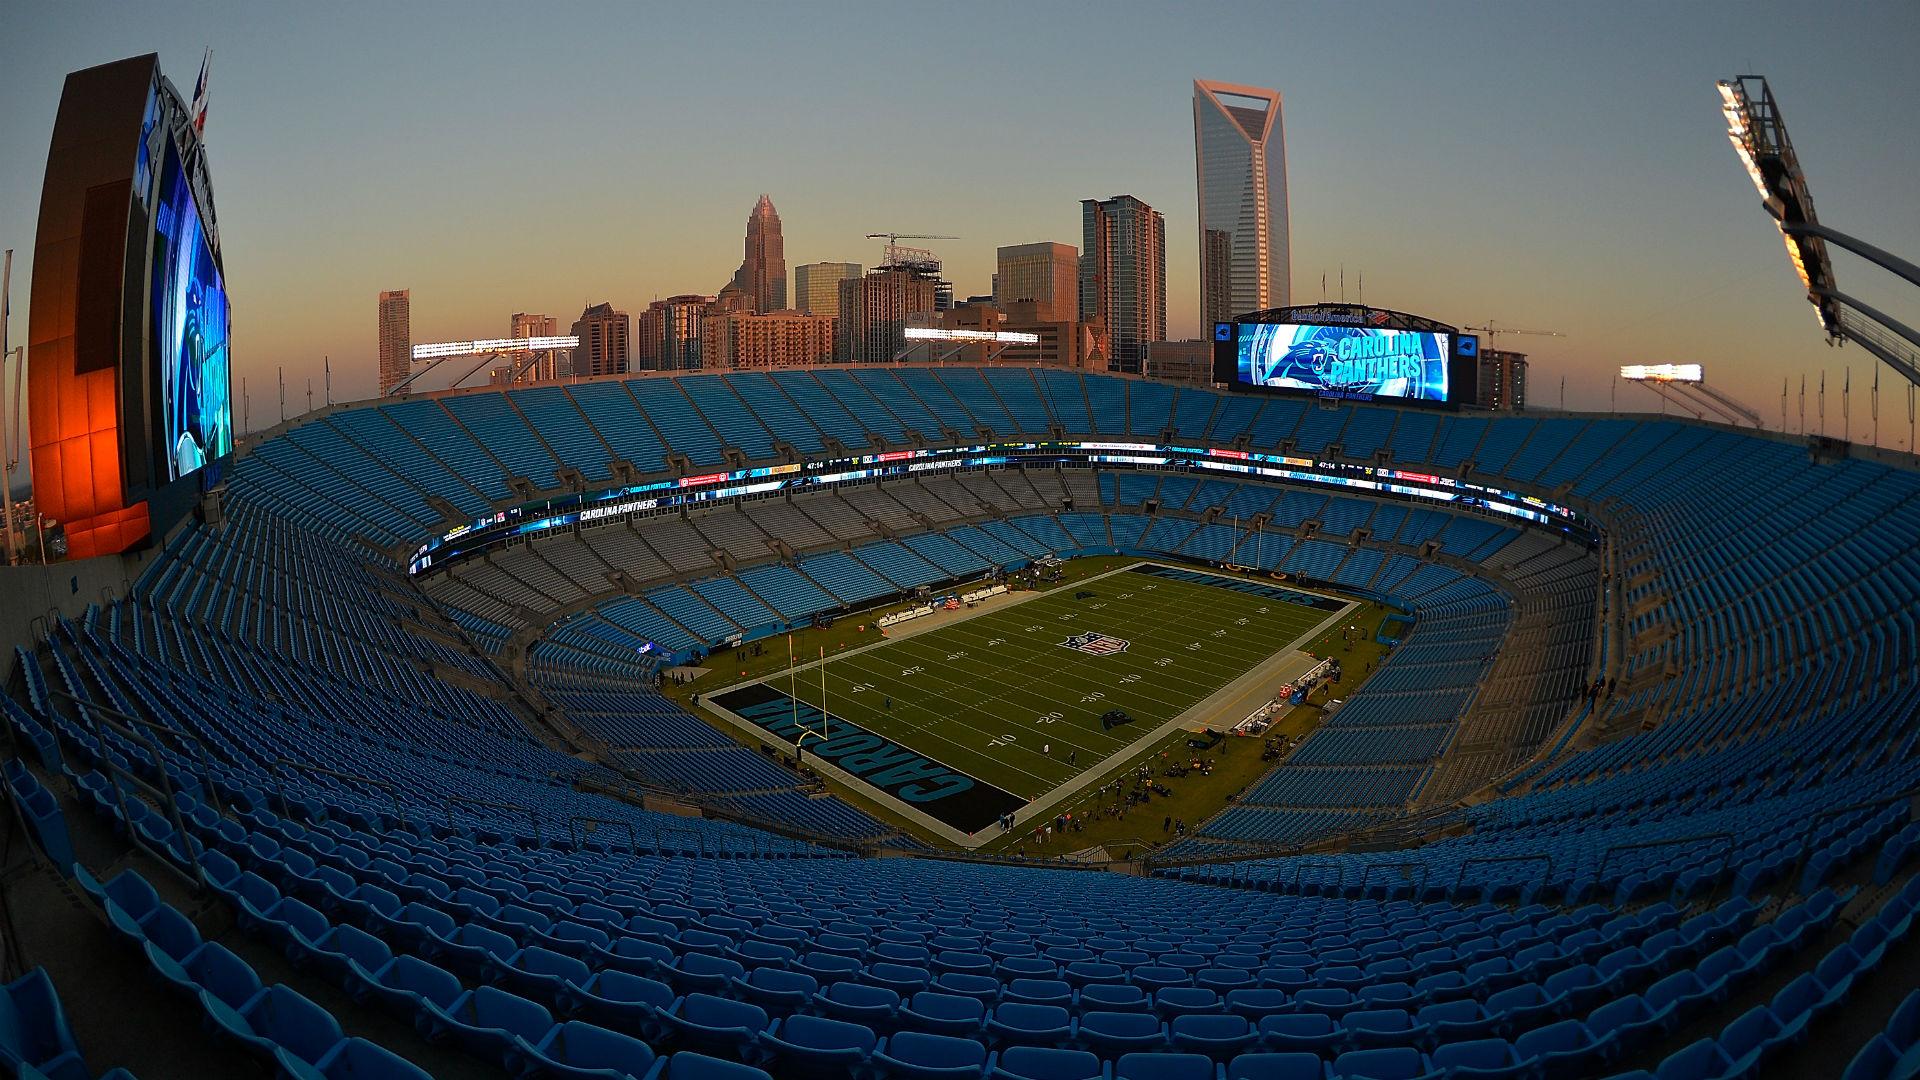 Bank of America Stadium North Carolina